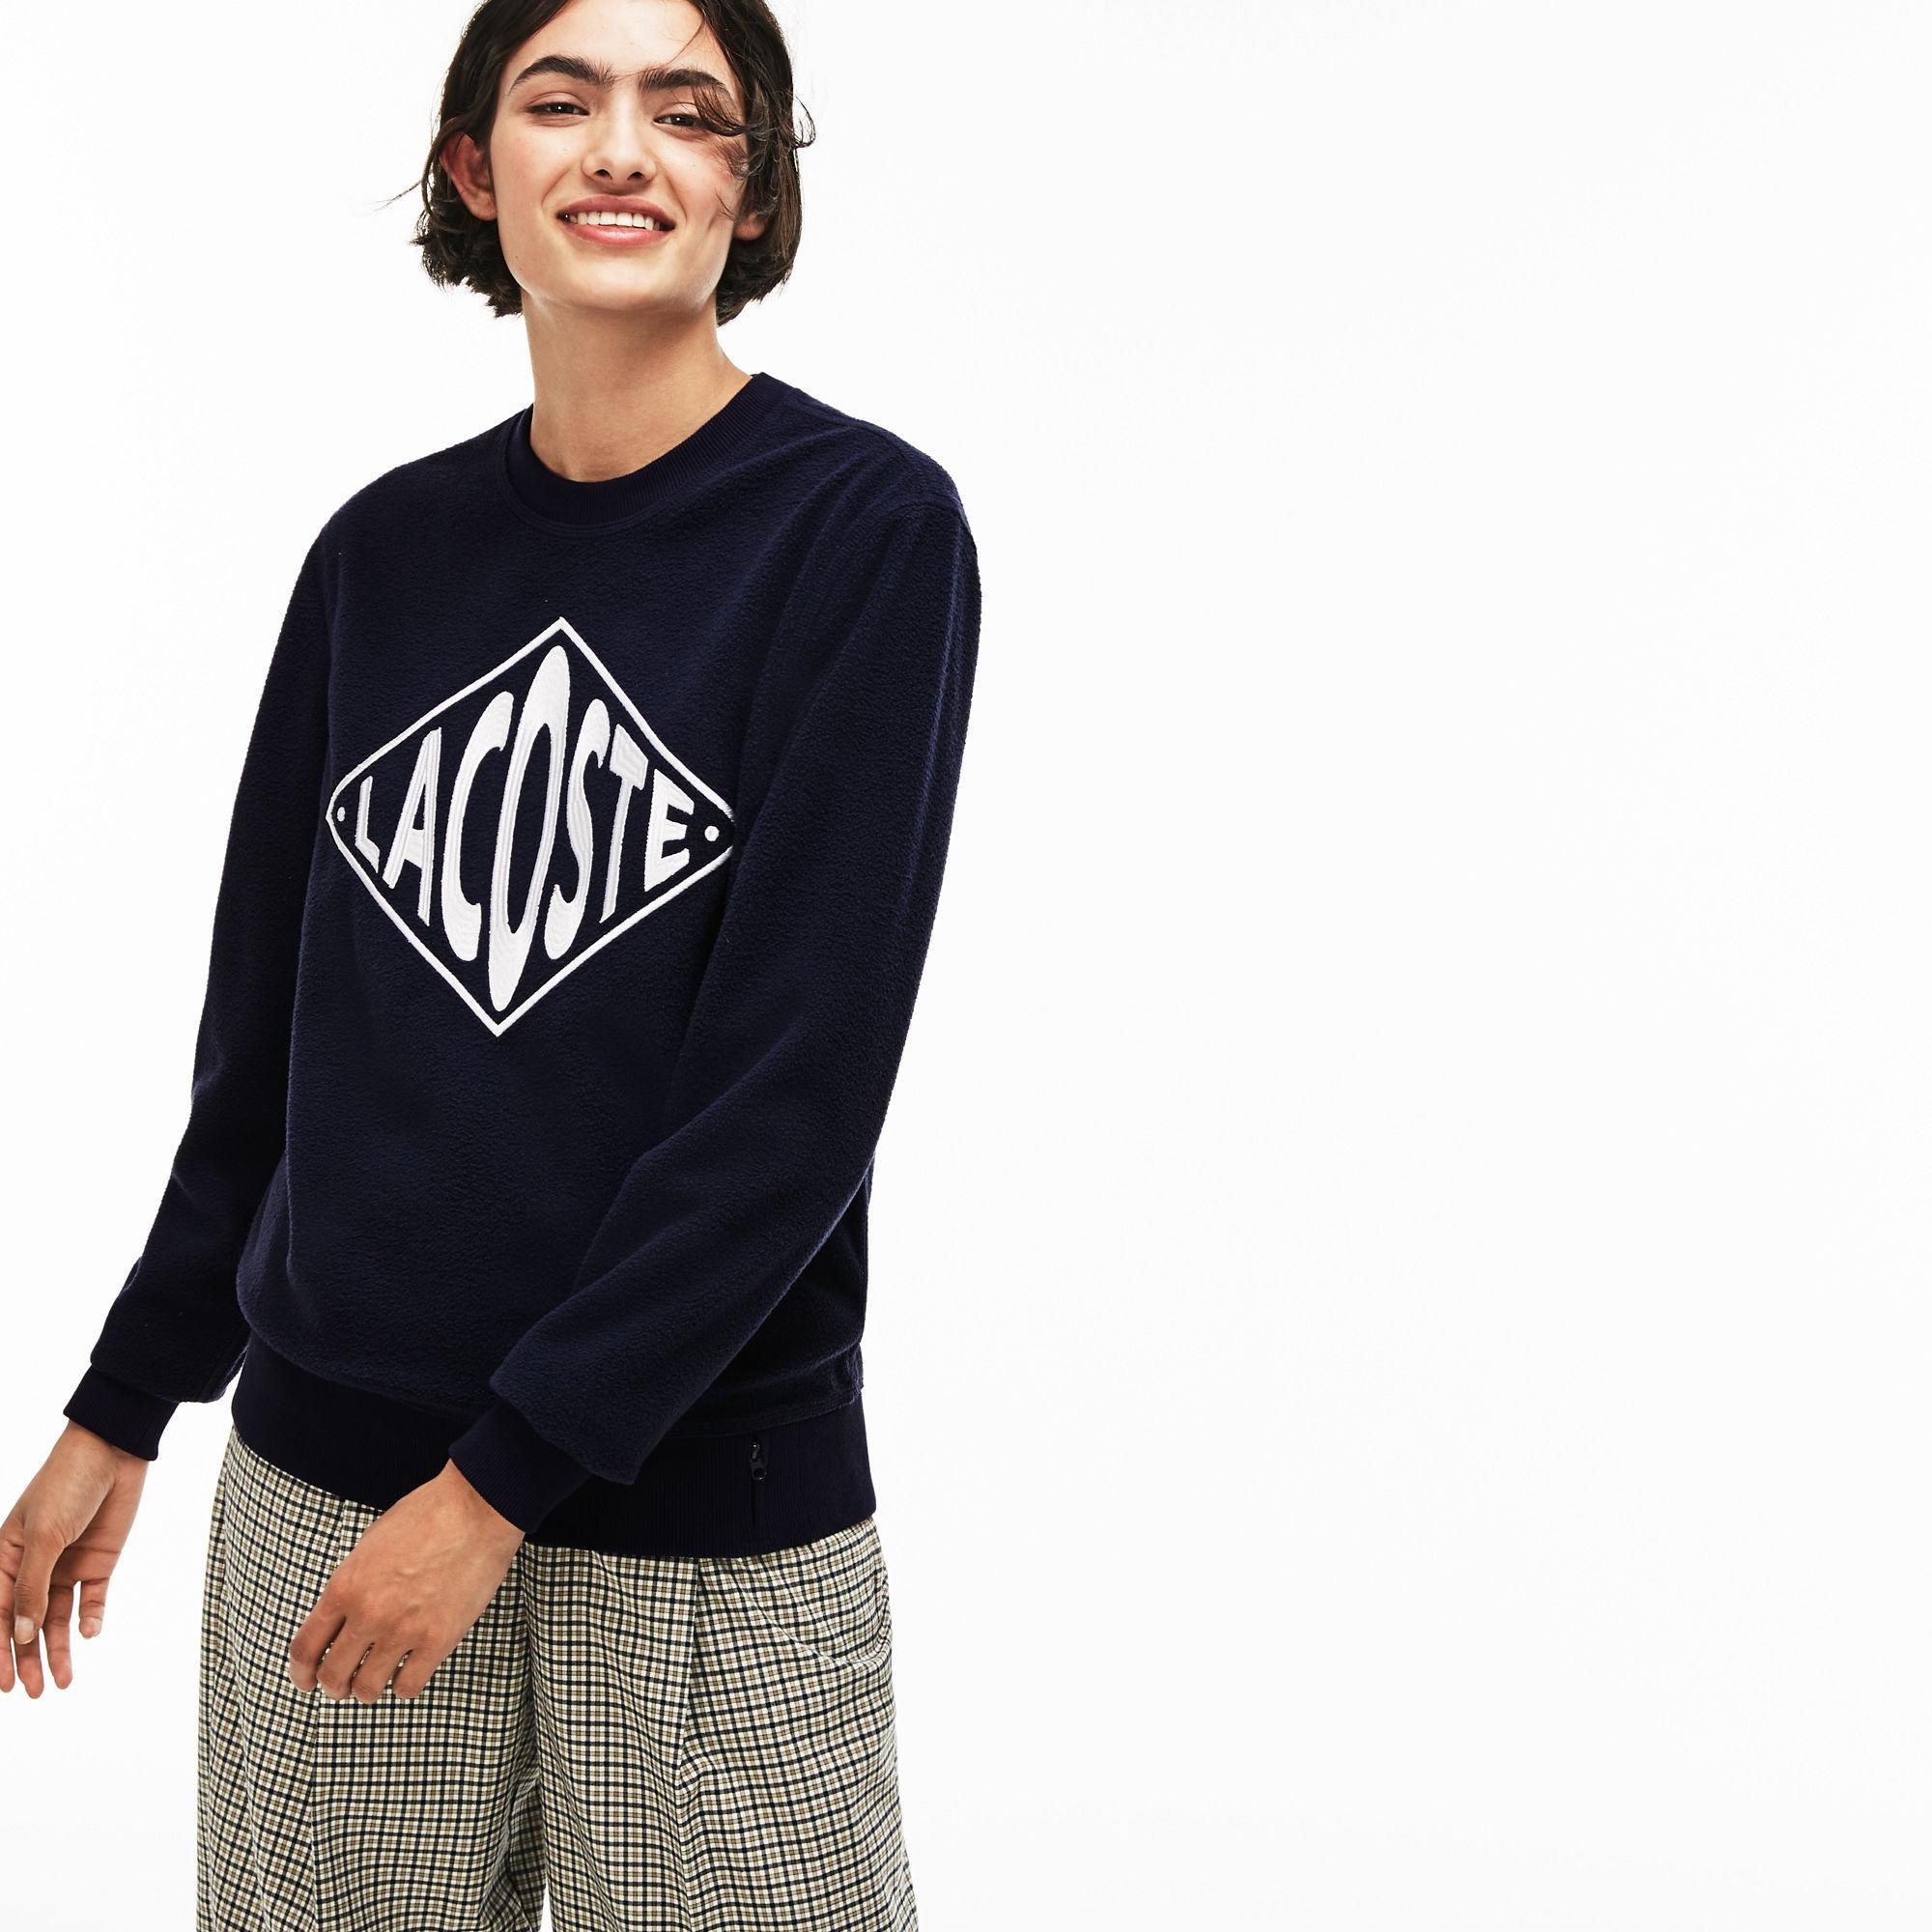 6add276ca Lyst - Lacoste Unisex Live Crew Neck Xl Embroidery Fleece Sweatshirt ...